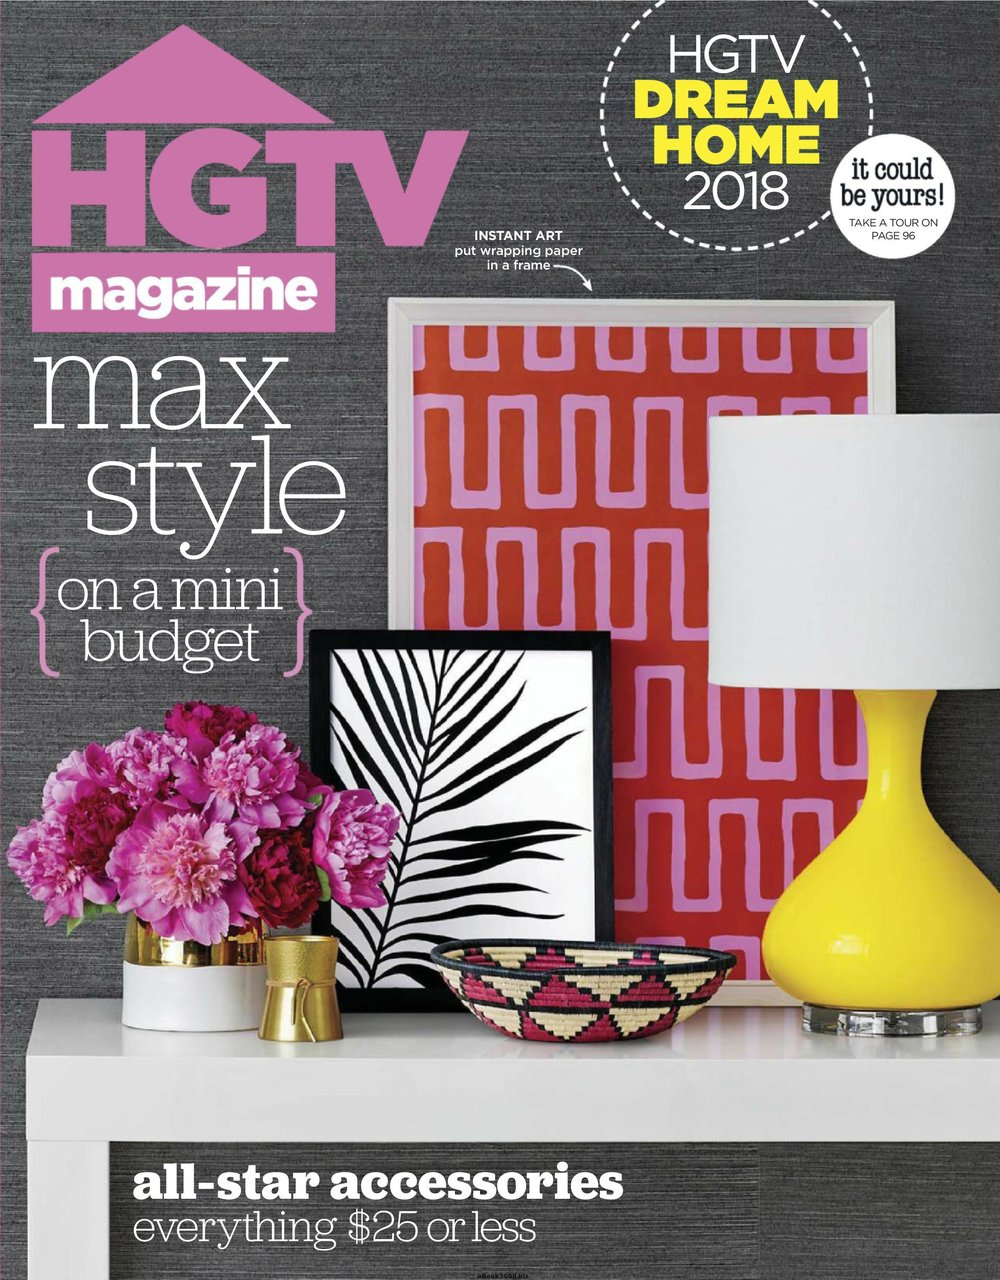 HGTV-Magazine-February-2018.jpg